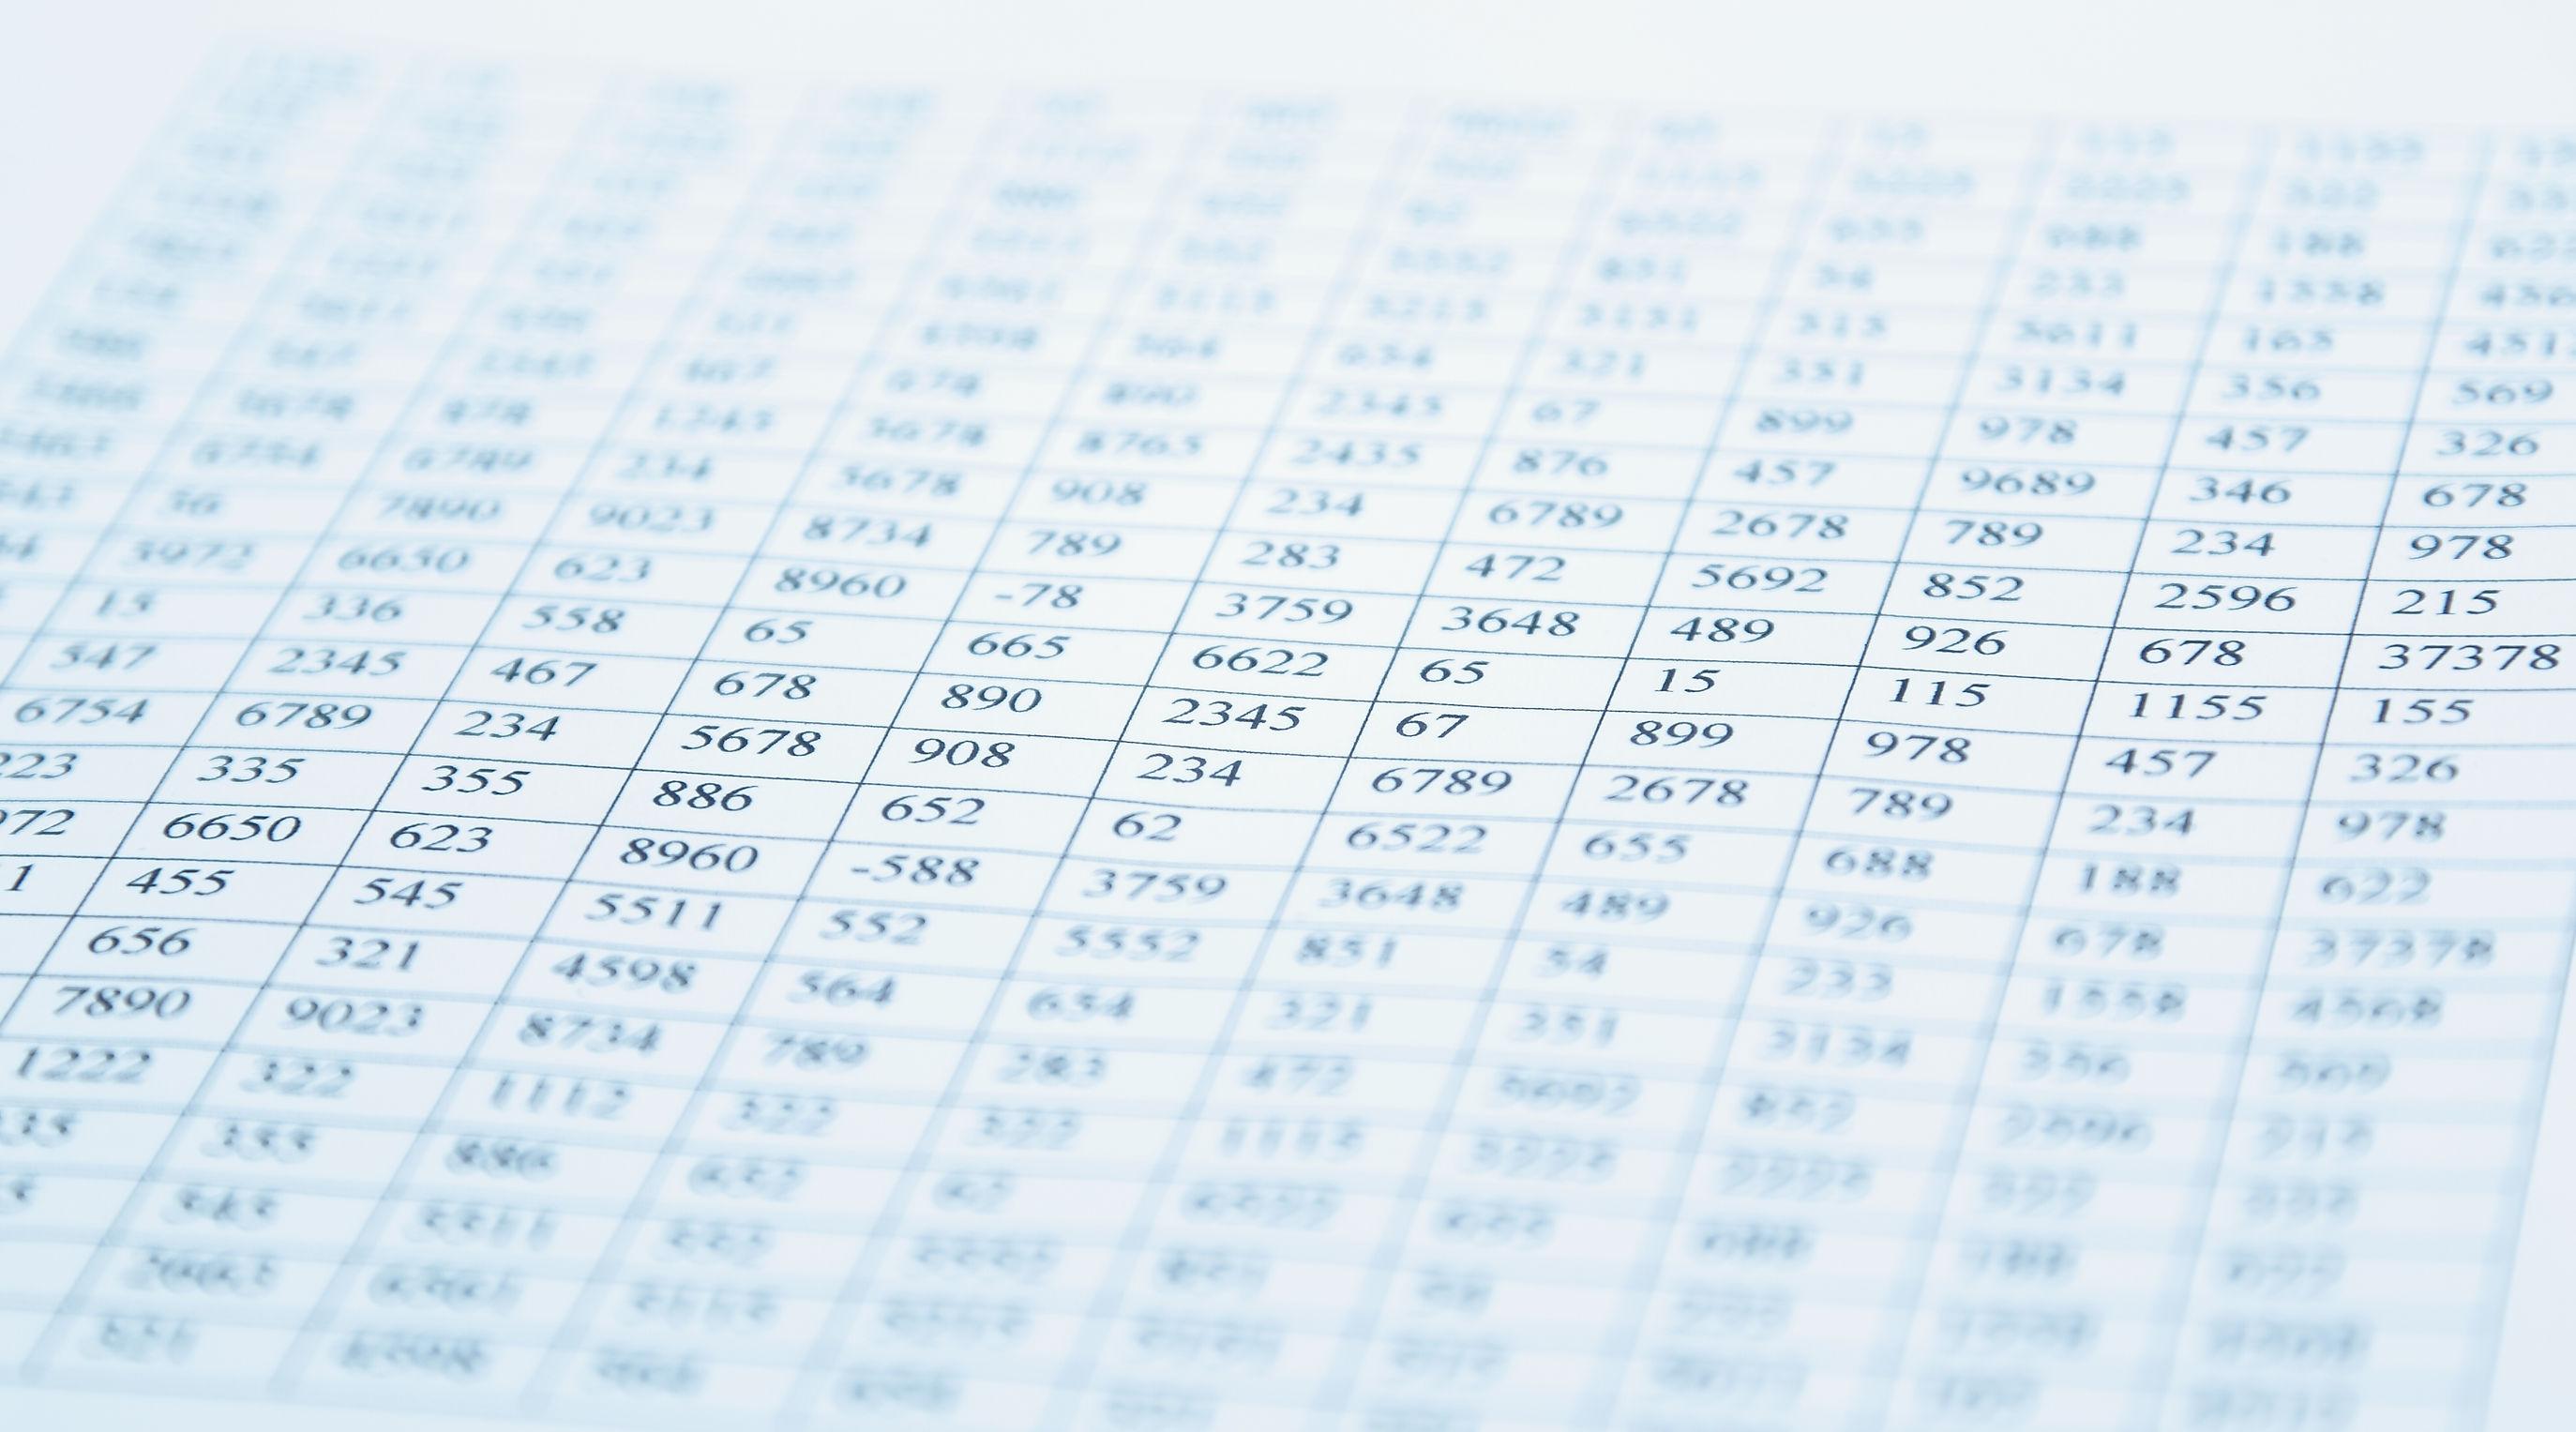 23344718 - Checking Balance - Preparation Of A Balance Sheet